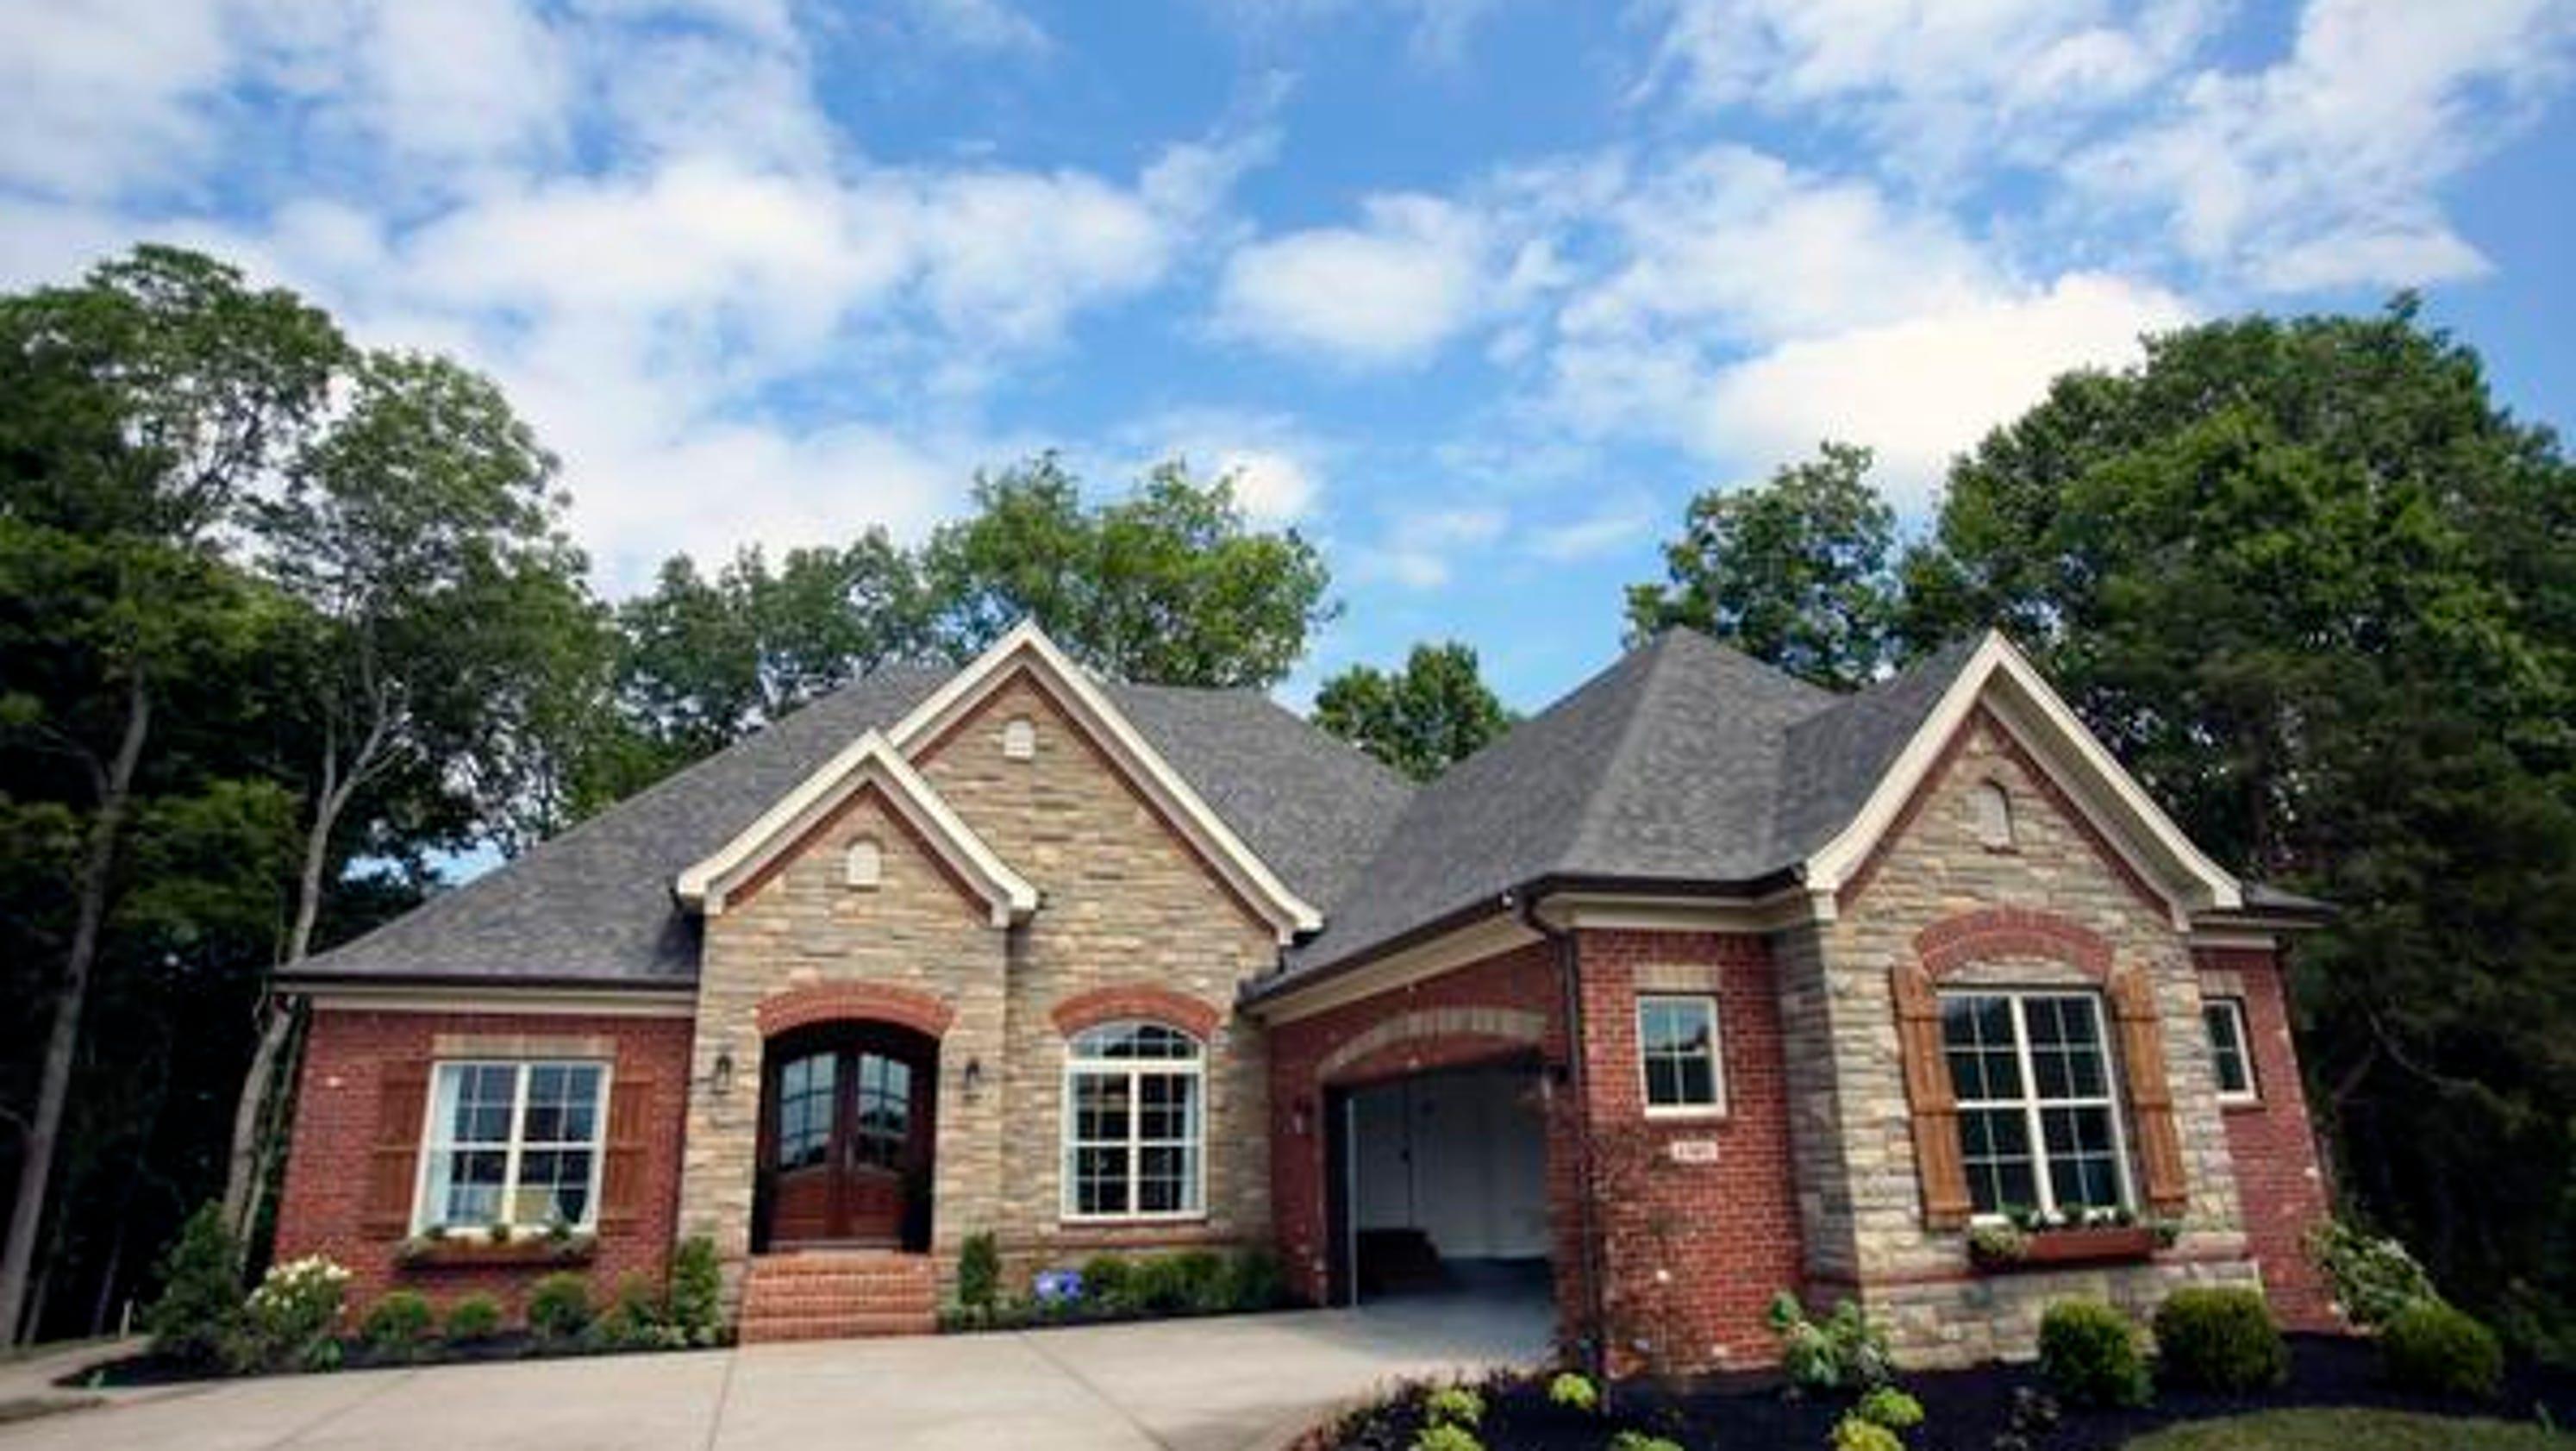 Home decorators lake zurich 28 images home decorators for Home decor zurich